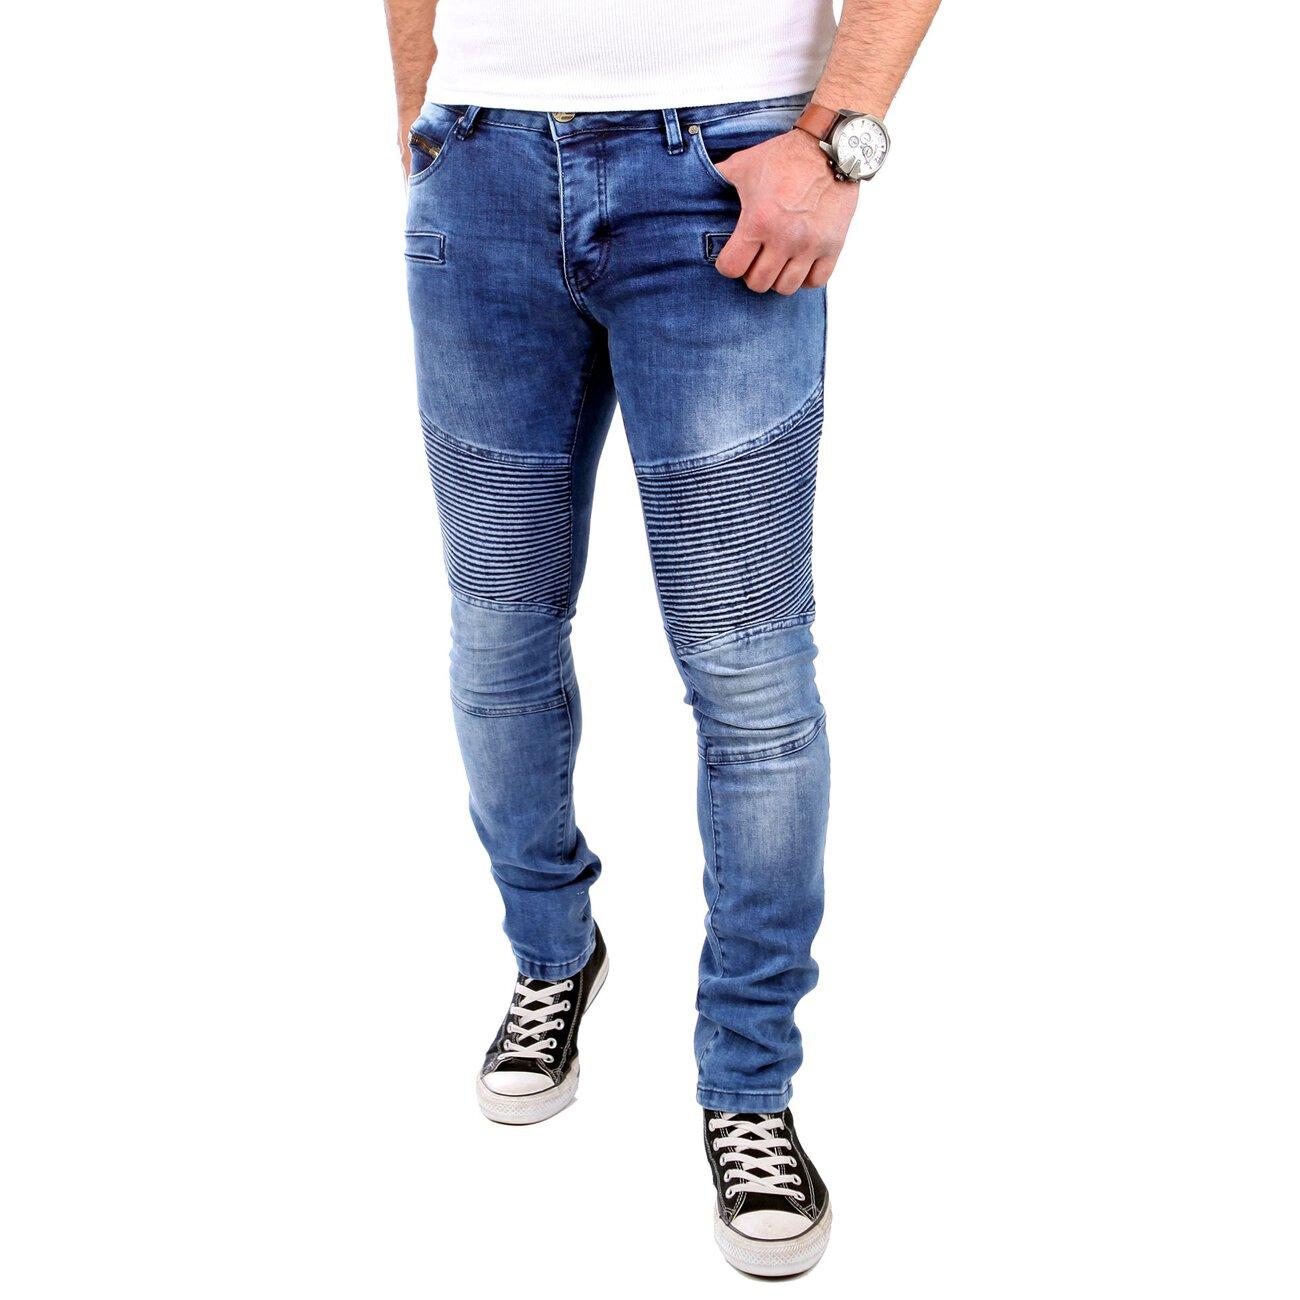 tazzio jogg jeans slim fit biker jogging jeans blau. Black Bedroom Furniture Sets. Home Design Ideas